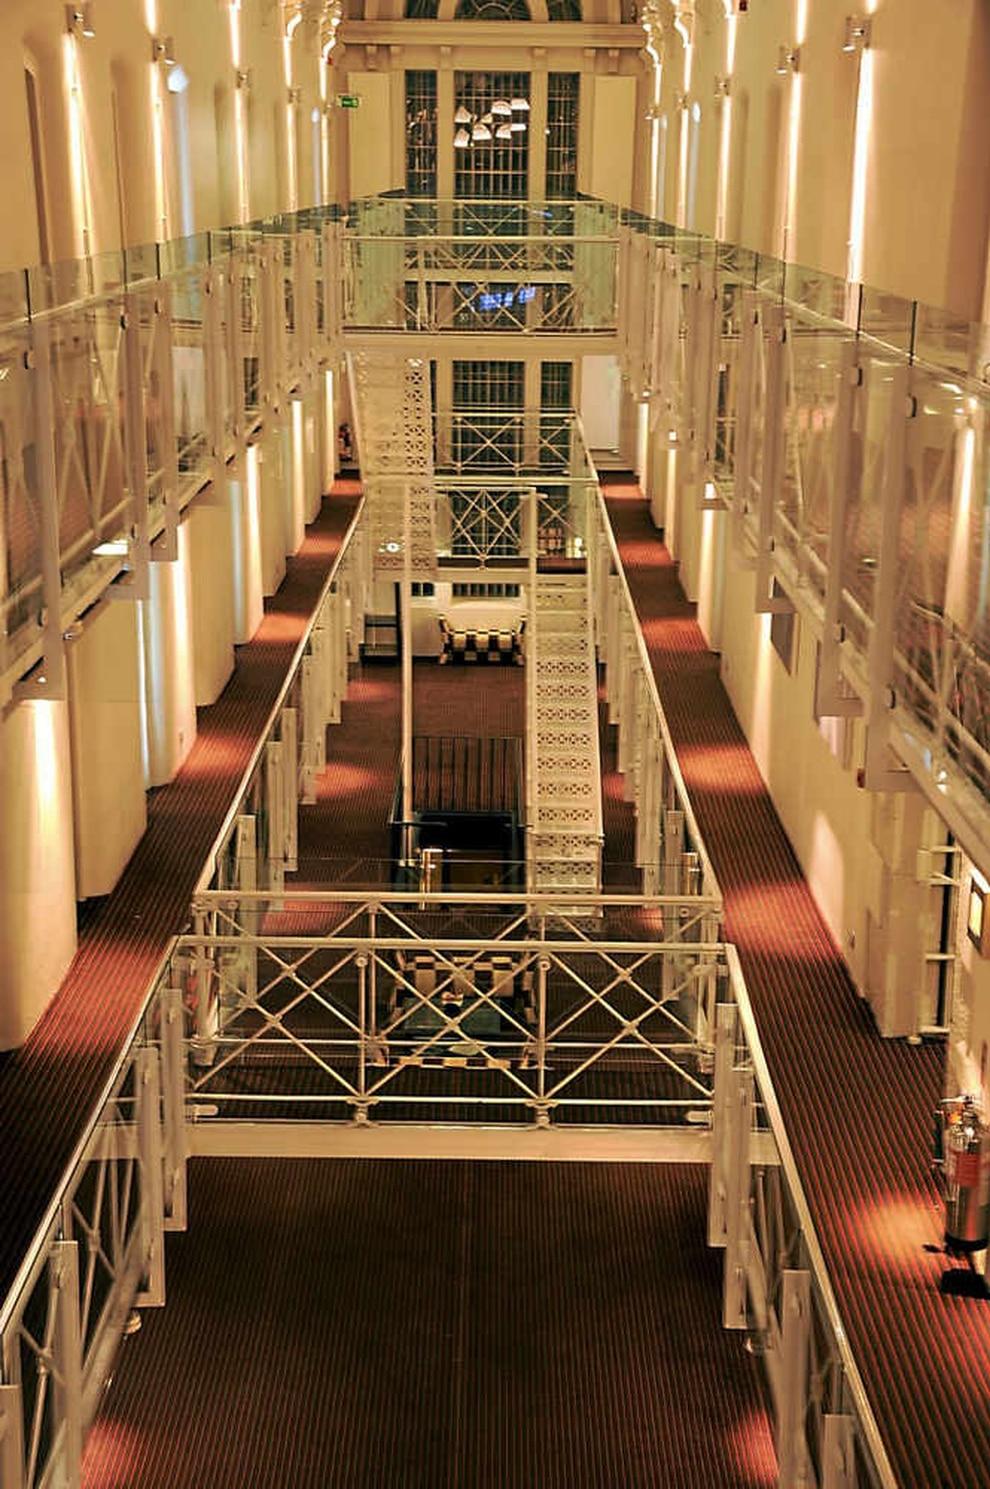 Hmp Oxford Hotel An Inspiration For Shrewsbury Dana Prison